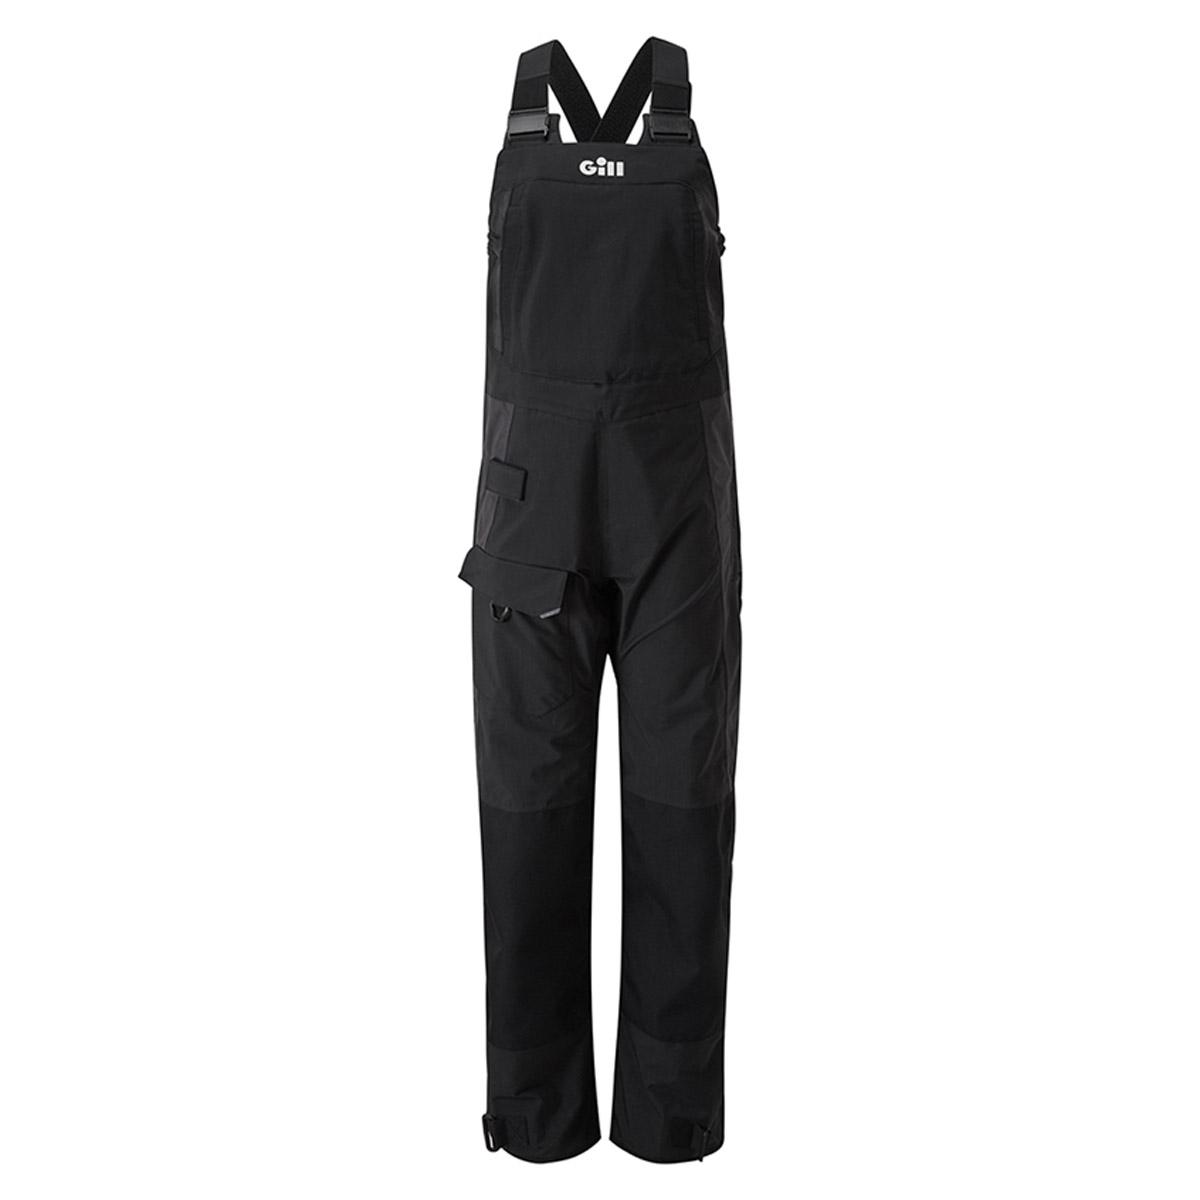 Gill Women's OS2 Offshore Trouser (OS24TW)